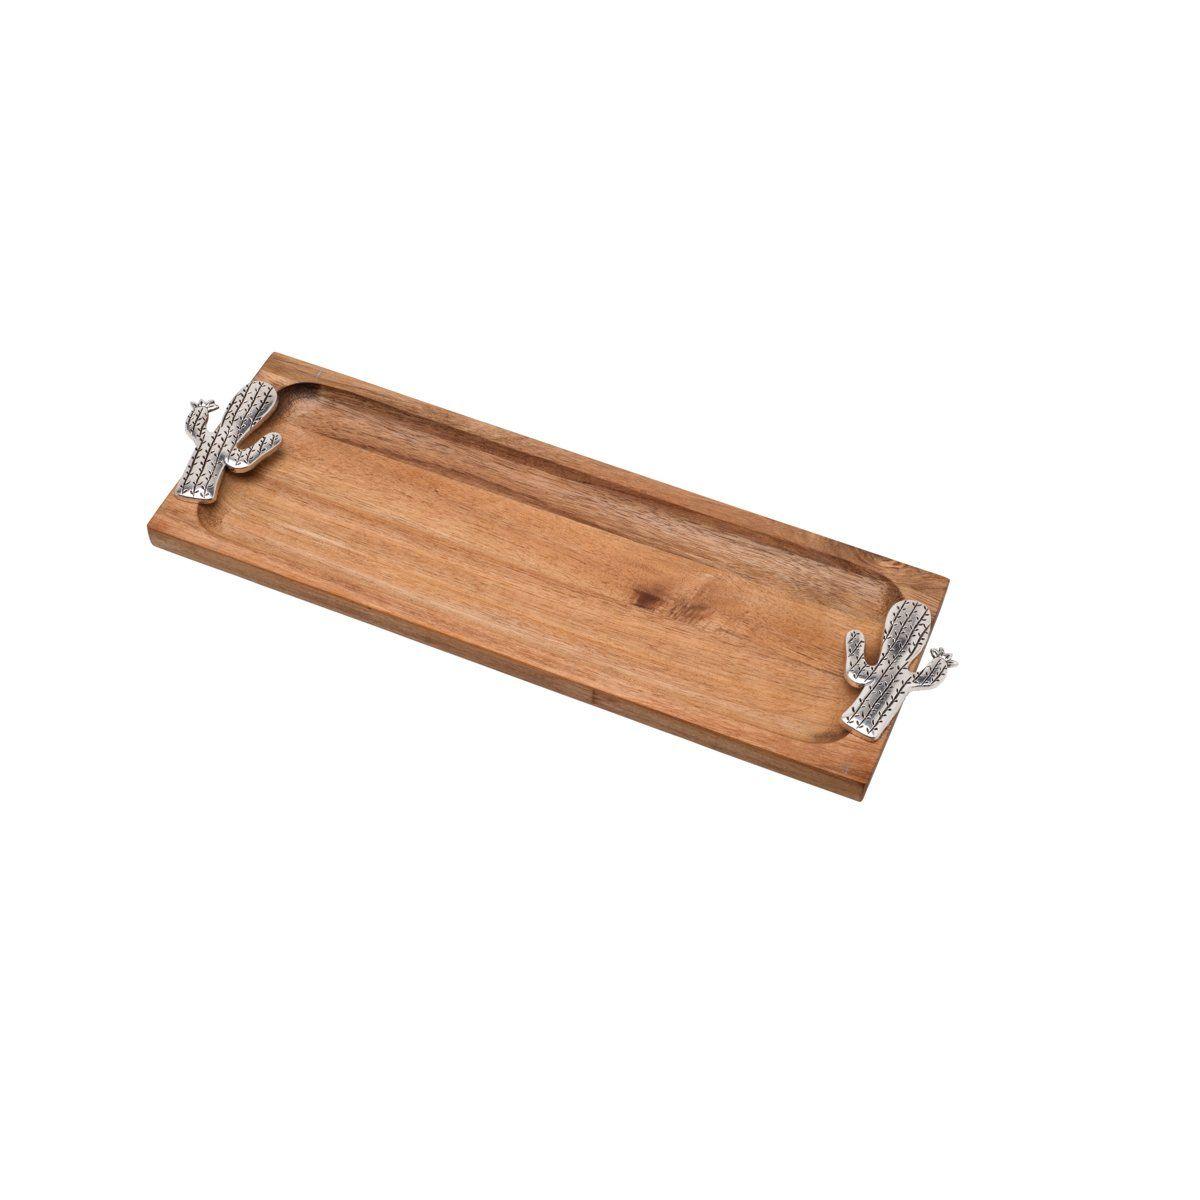 Petisqueira, bandeja 36 cm de madeira e zamac Acácia Cactus Bon Gourmet - 26360